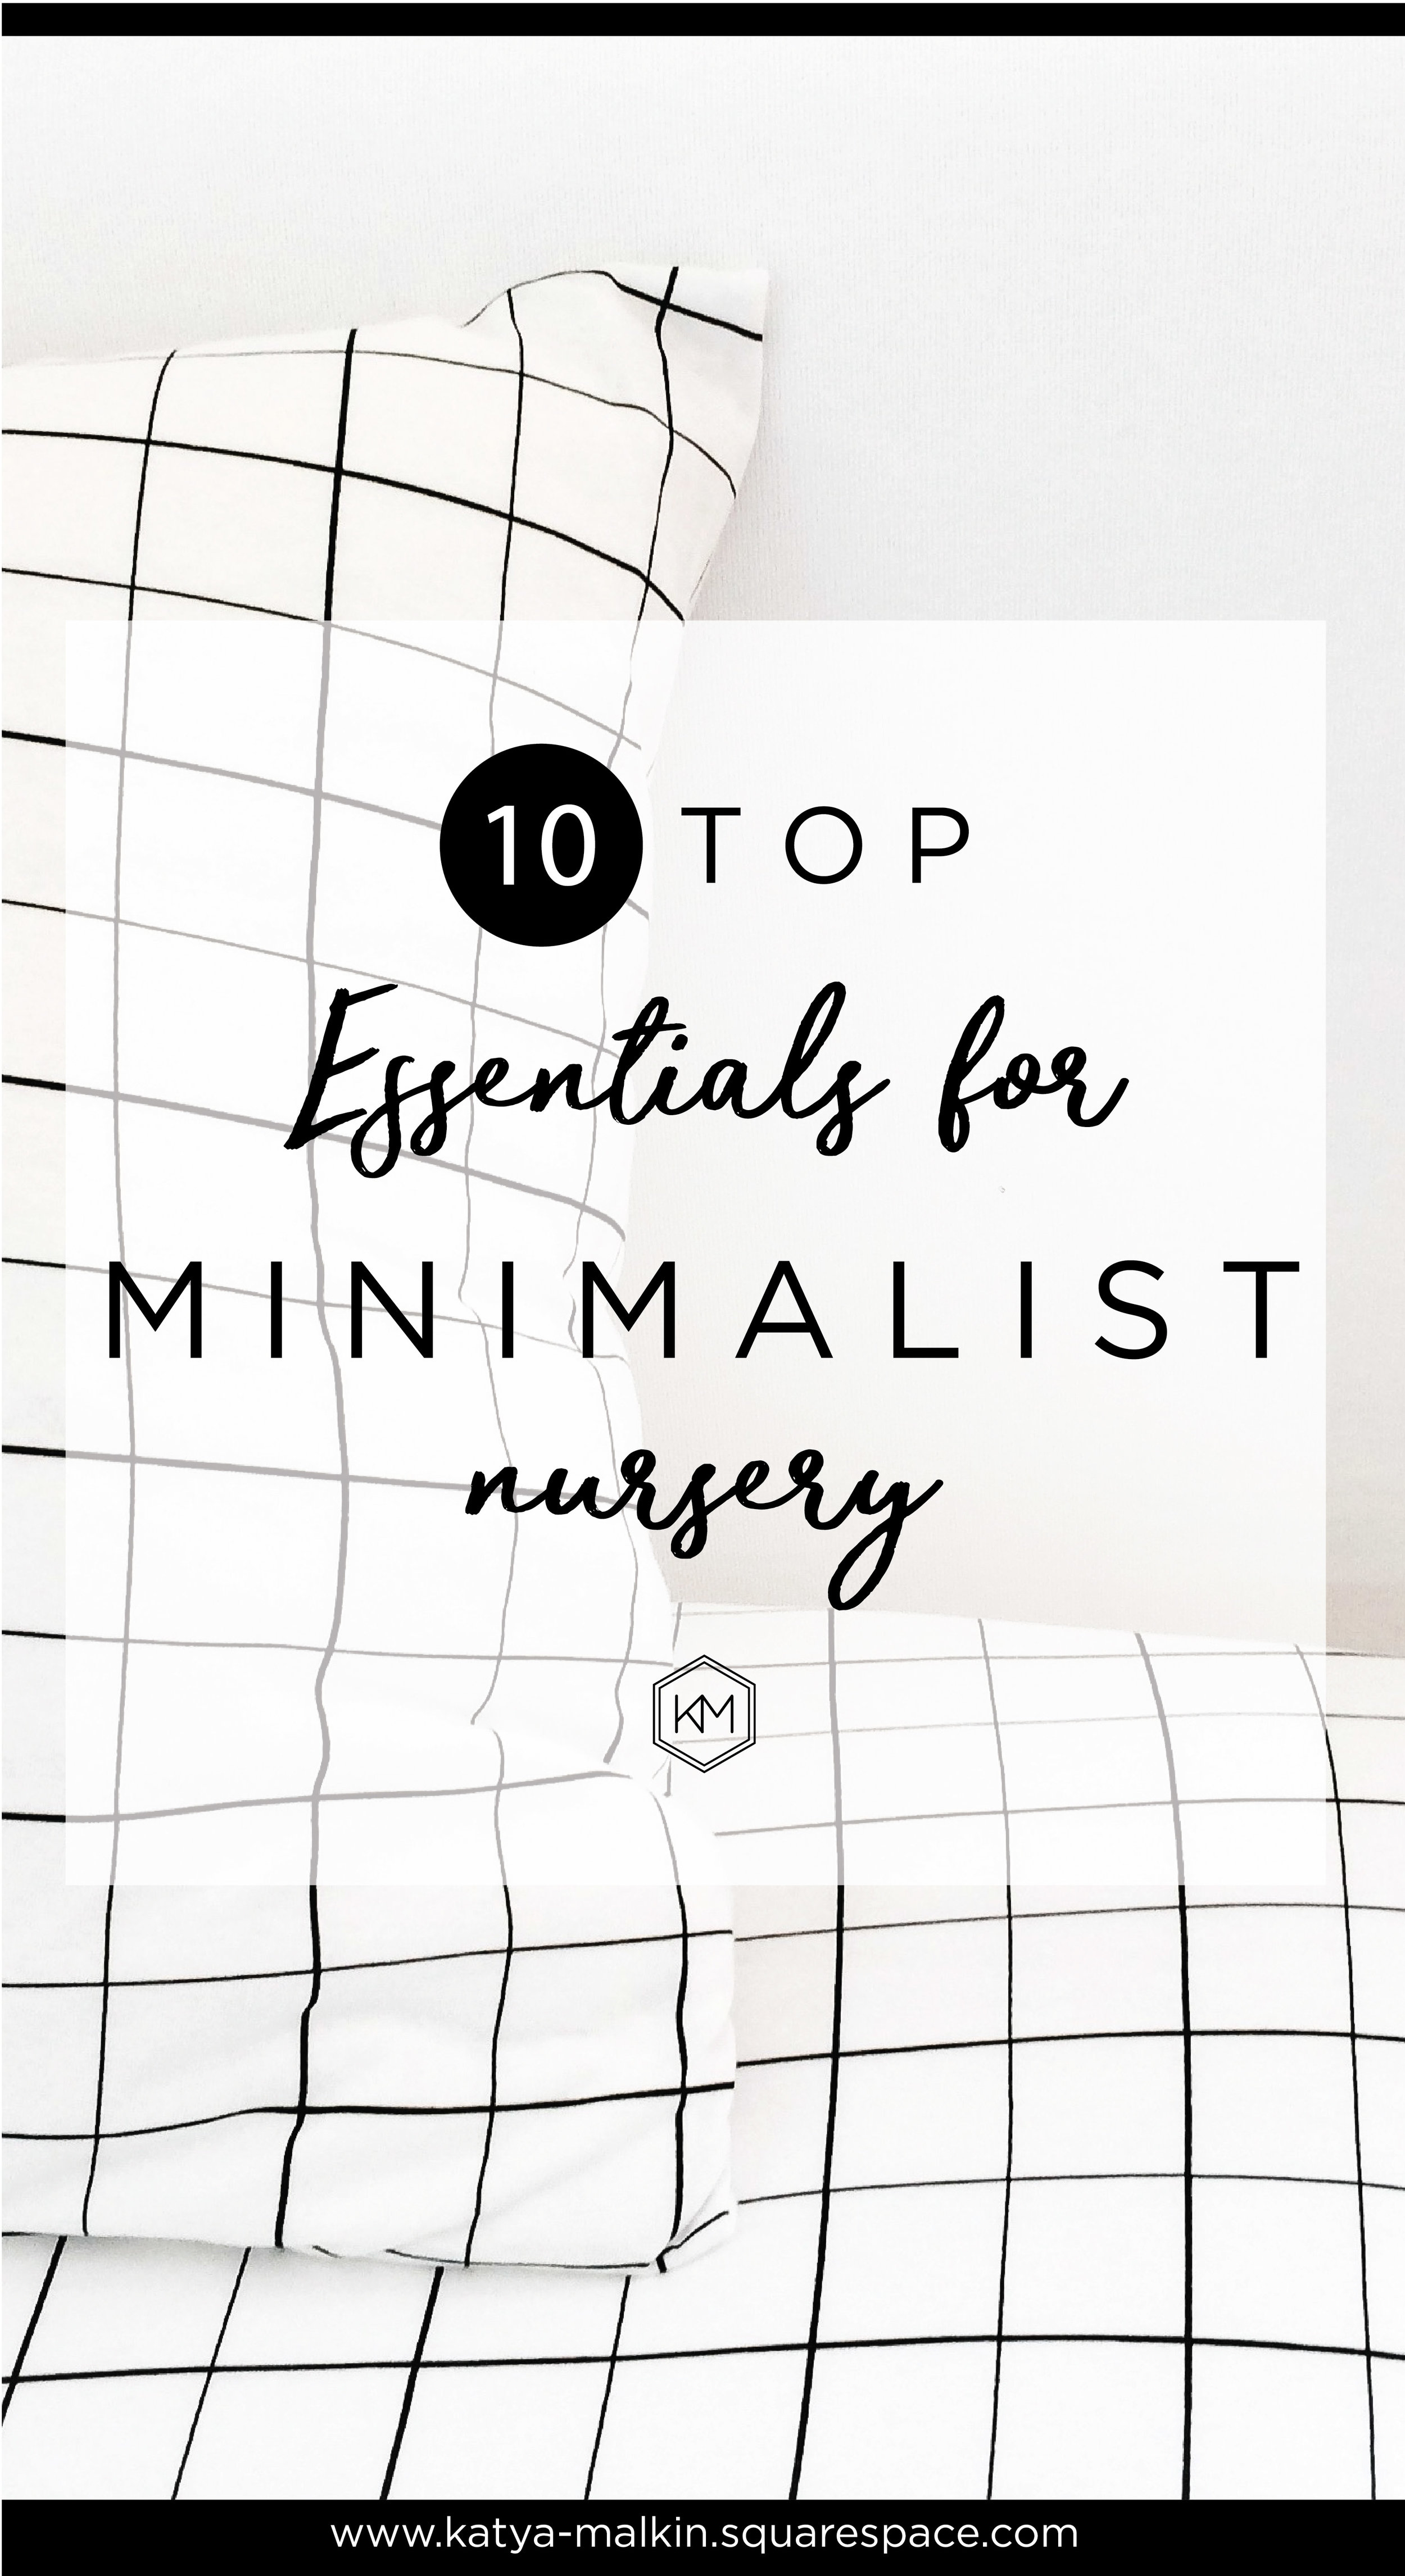 Minimalist nursery by Katya Malkin